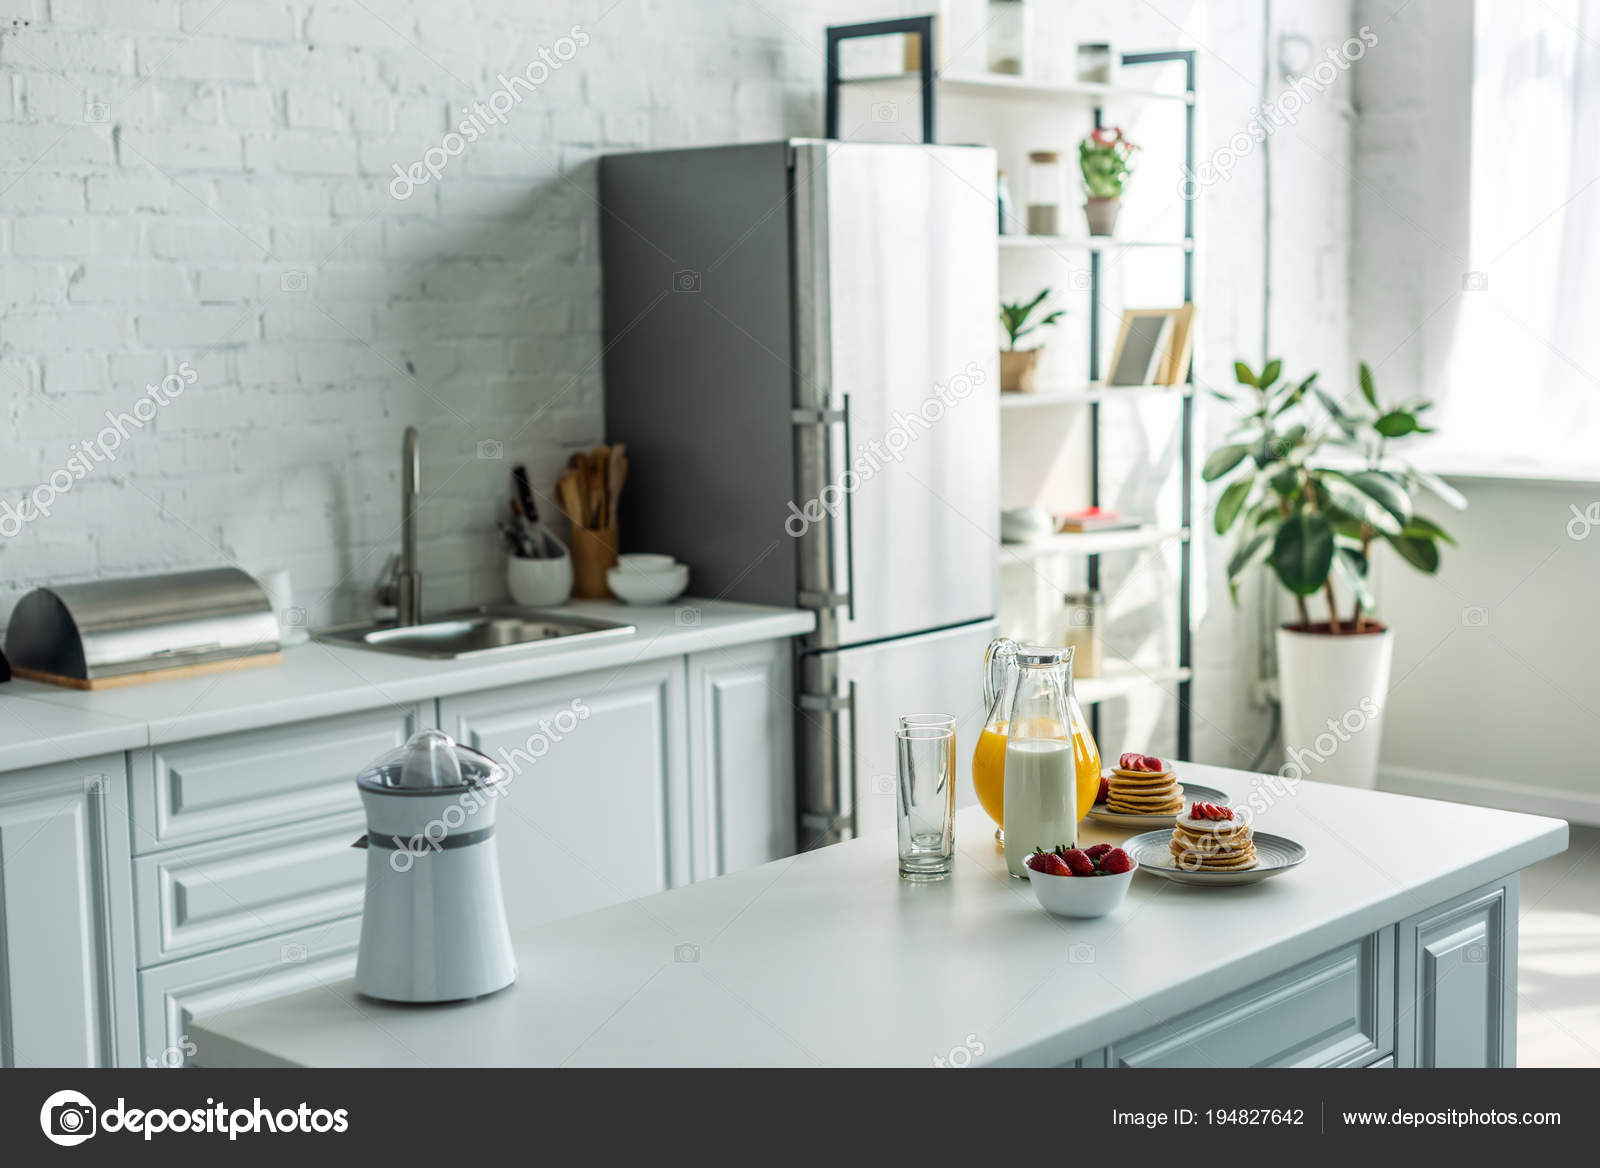 kitchen counters cheap sink faucets 现代轻厨房的内部与冰箱和厨房柜台 图库照片 c vitalikradko 194827642